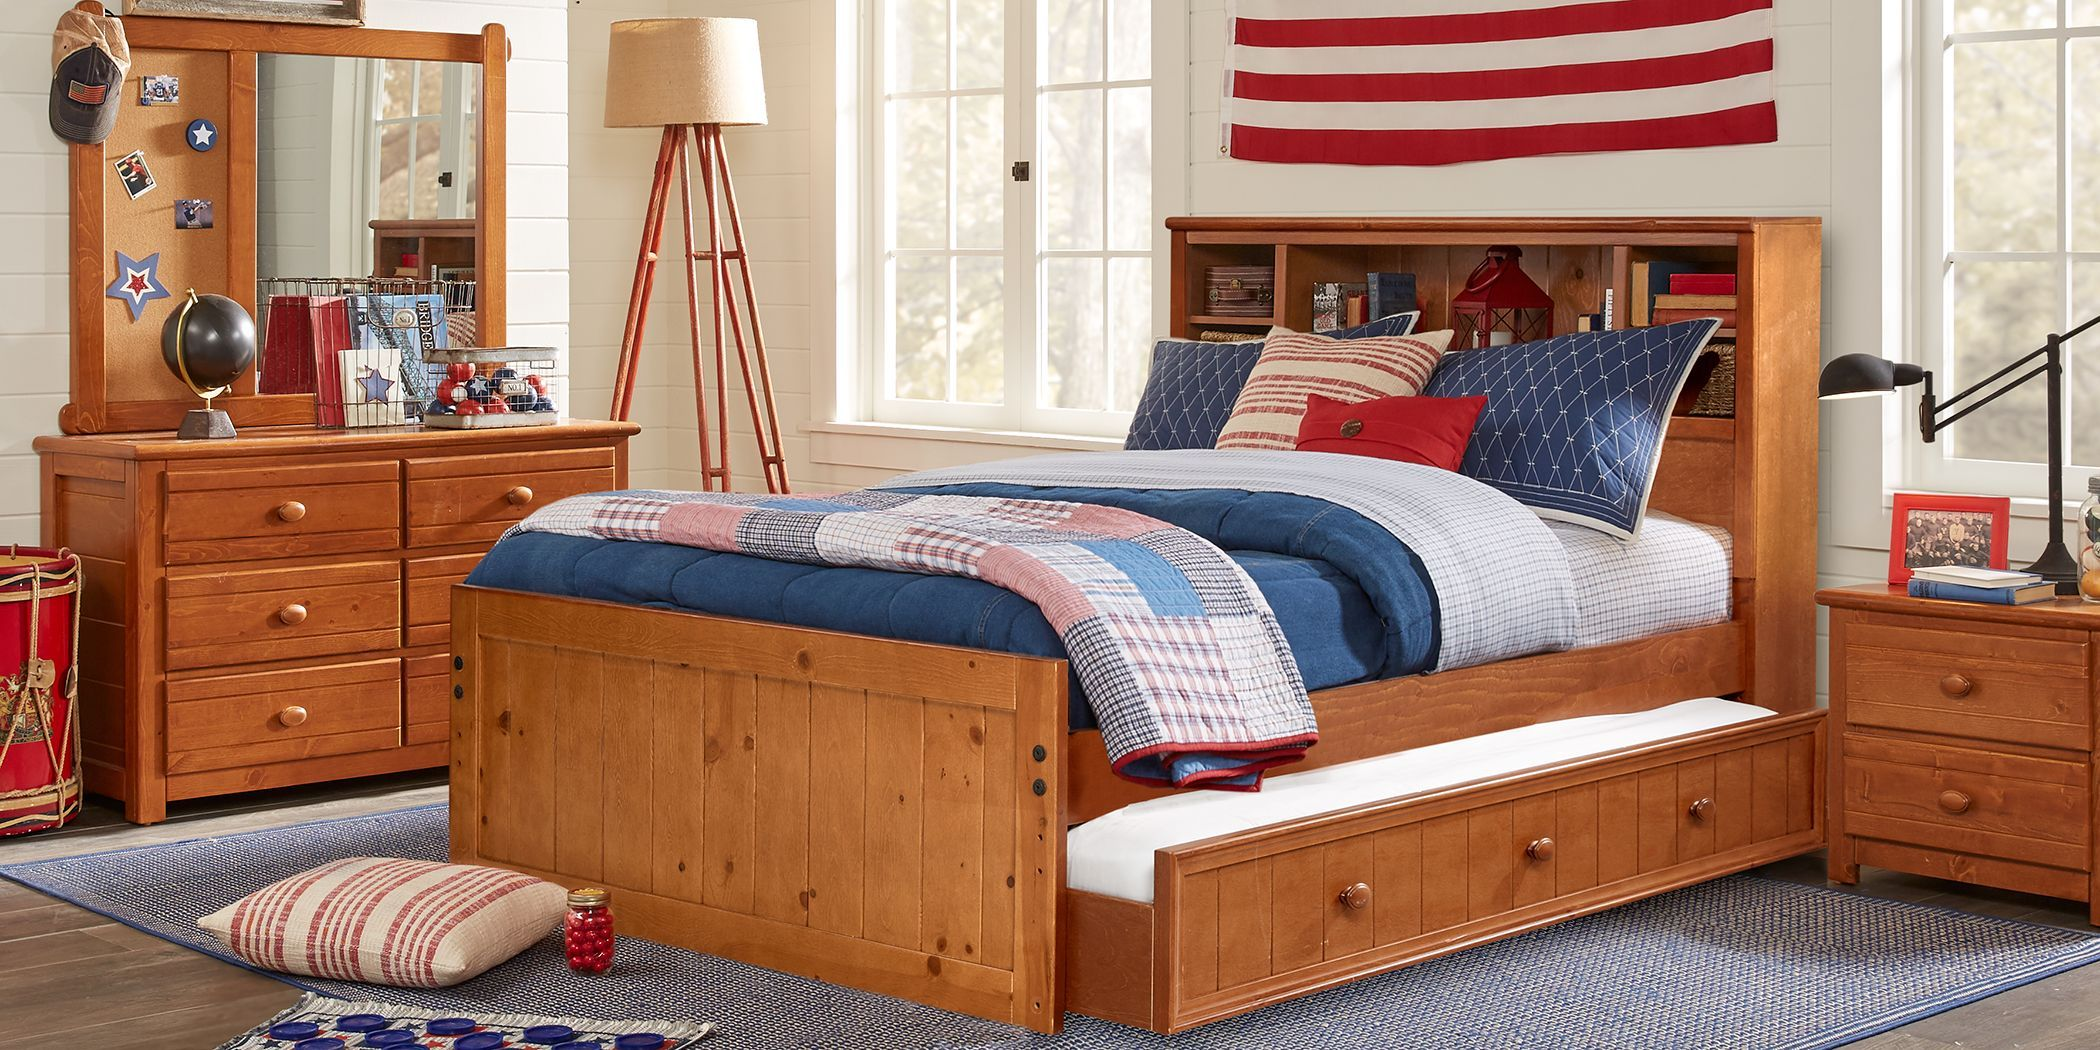 Kids Creekside Taffy 6 Pc Full Bookcase Bedroom Bedroom Furniture Stores Kids Furniture Stores Bedroom Furniture Sets